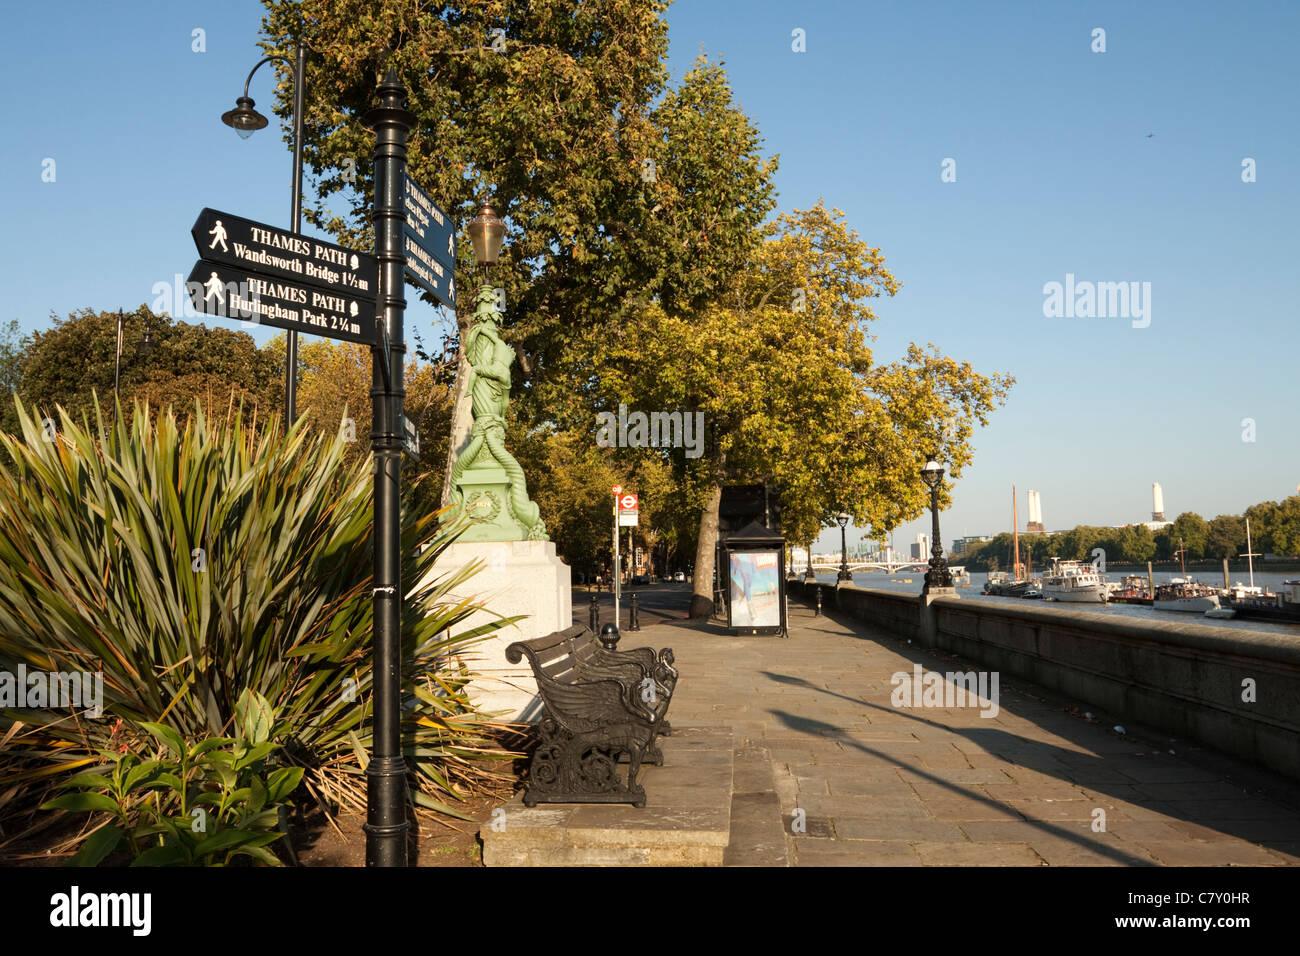 Thames Path, Chelsea Embankment, London, England, UK - Stock Image